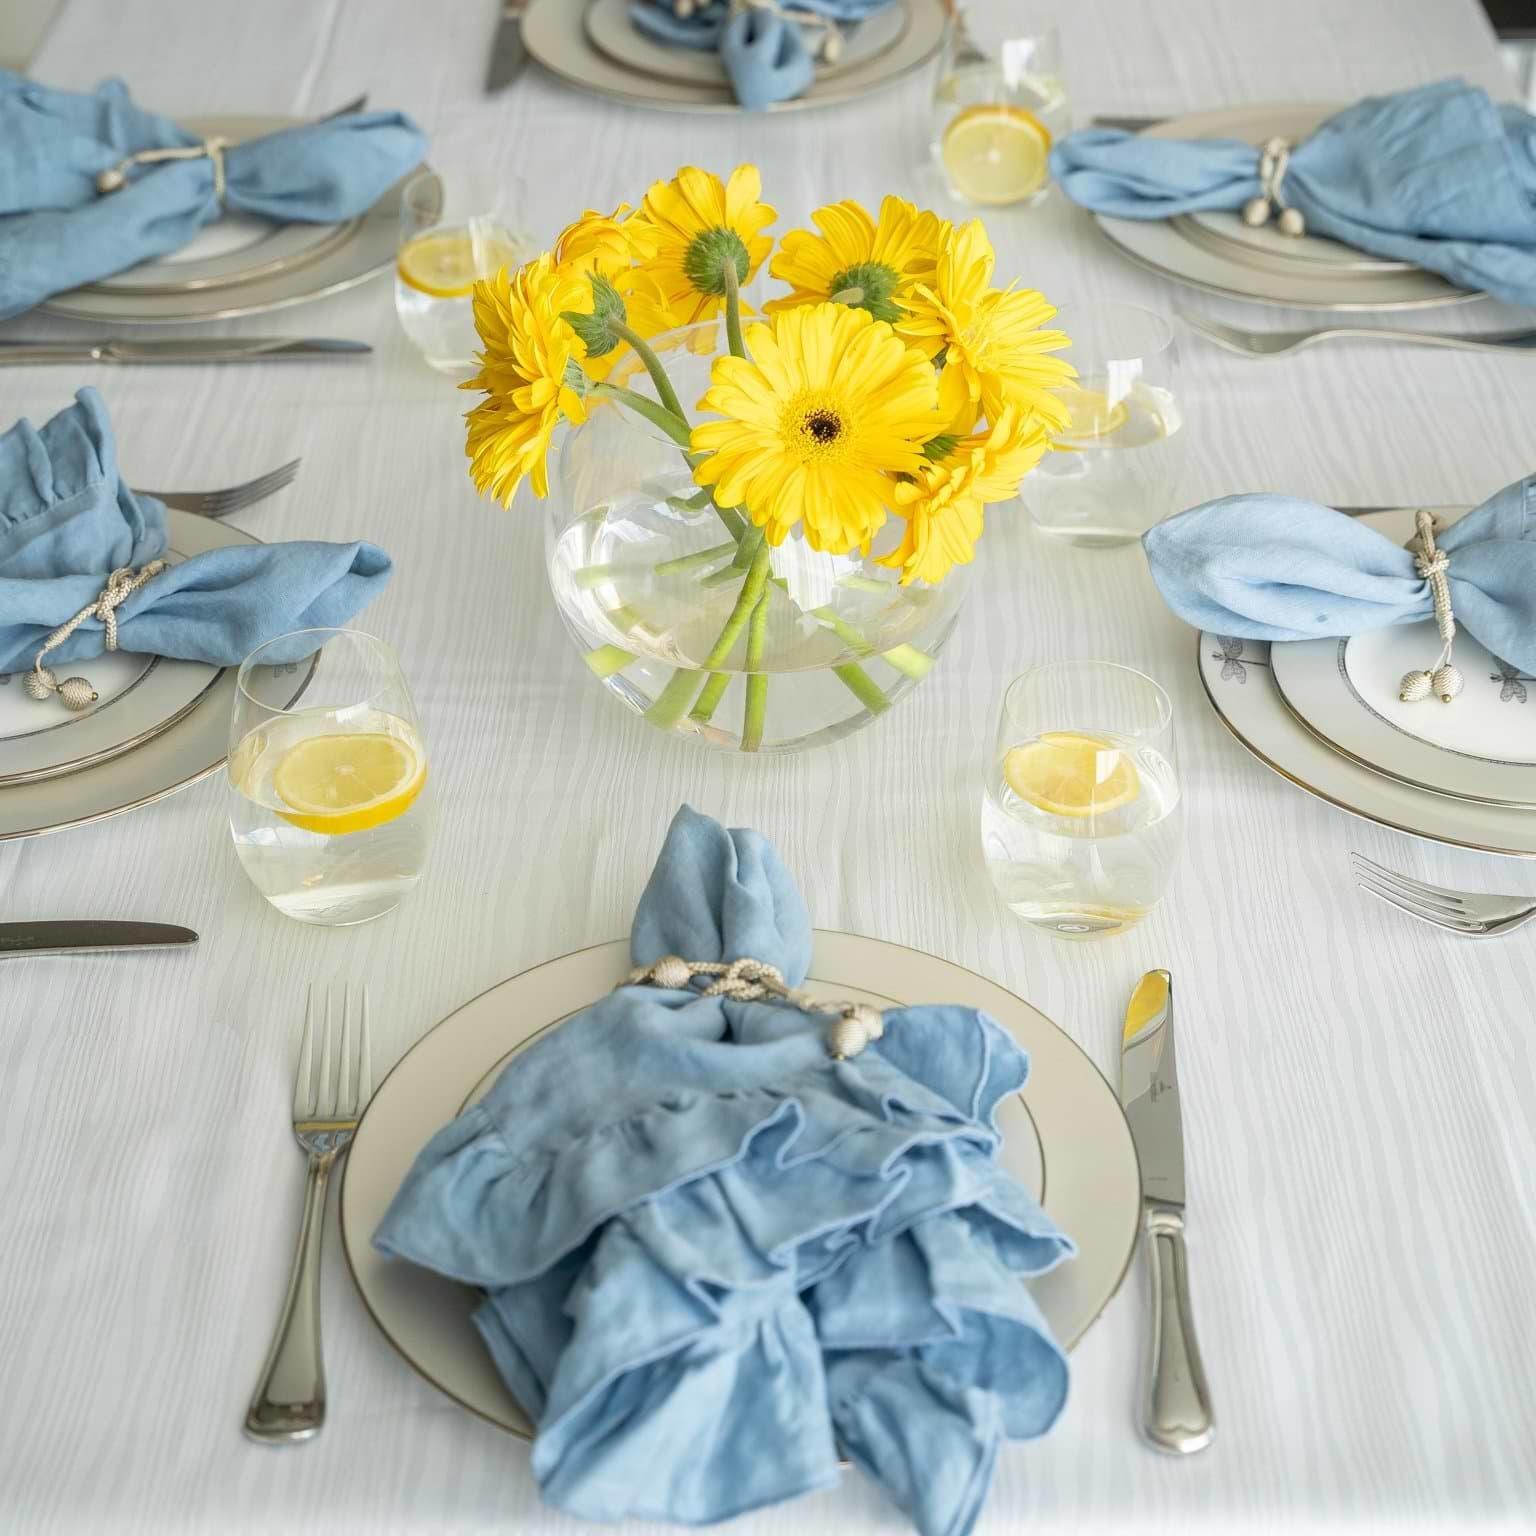 Madison White Tablecloth 66 x 108